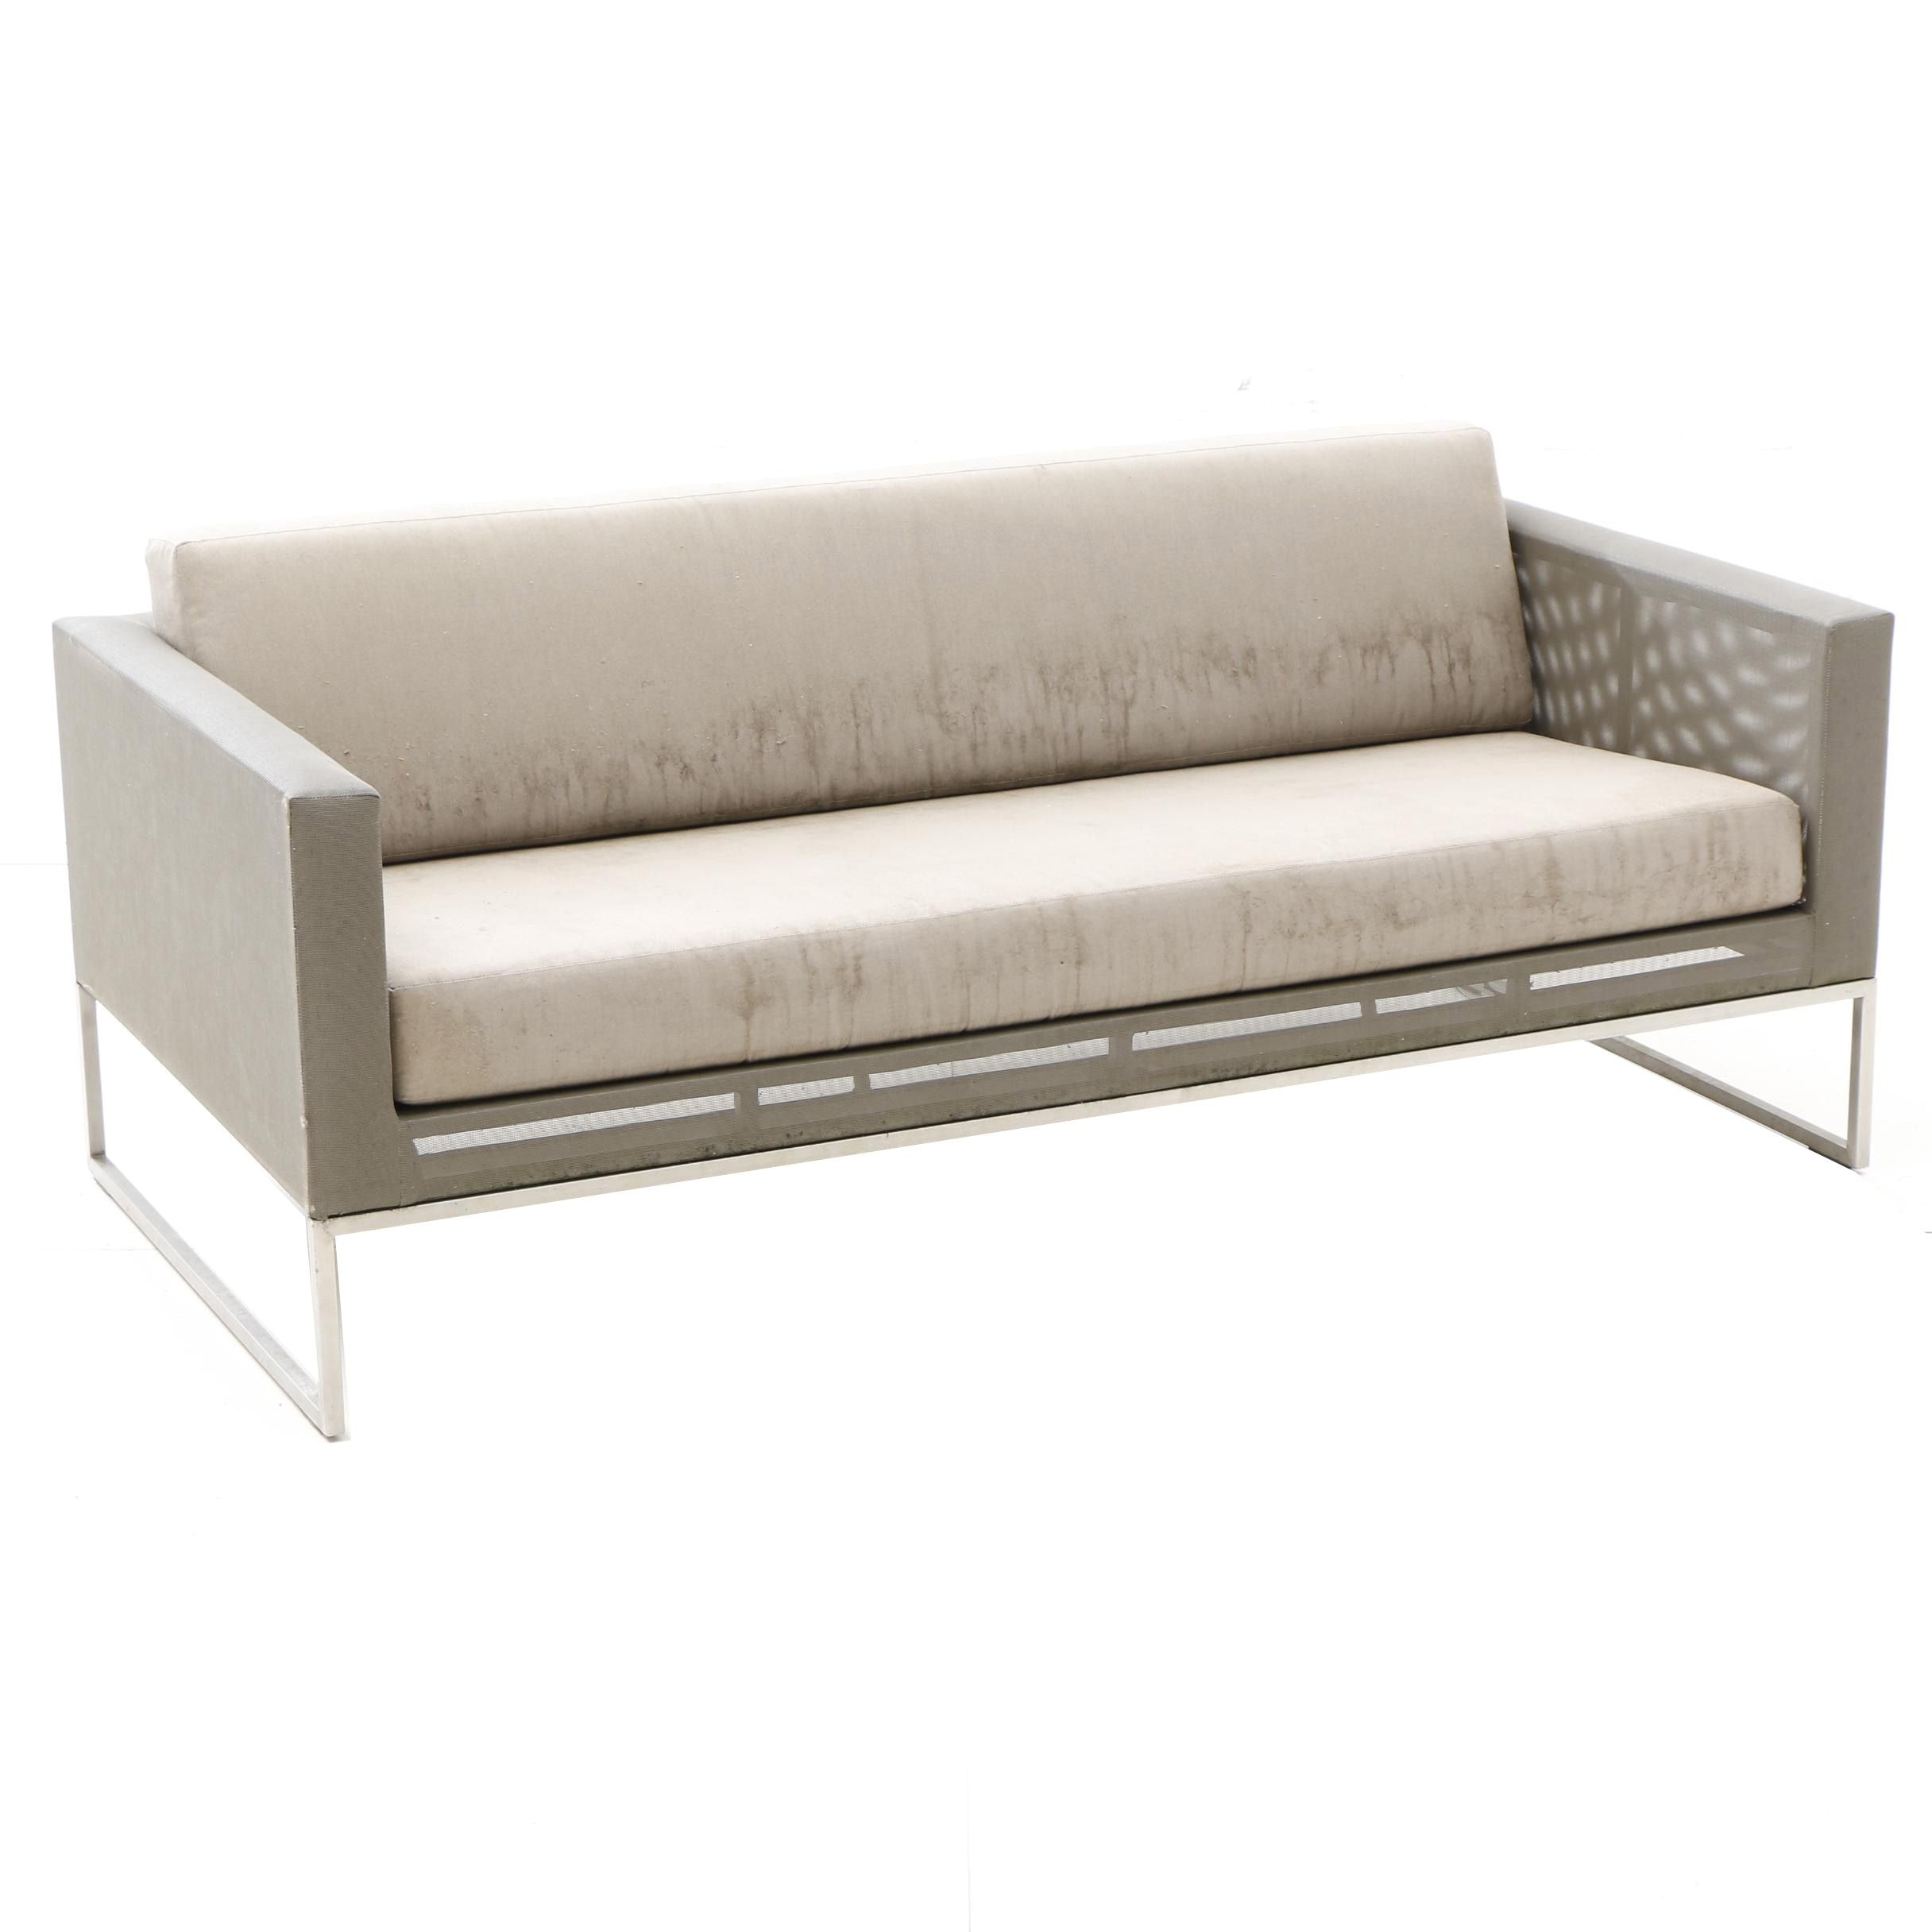 Outdoor Patio Sofa, Crate and Barrel